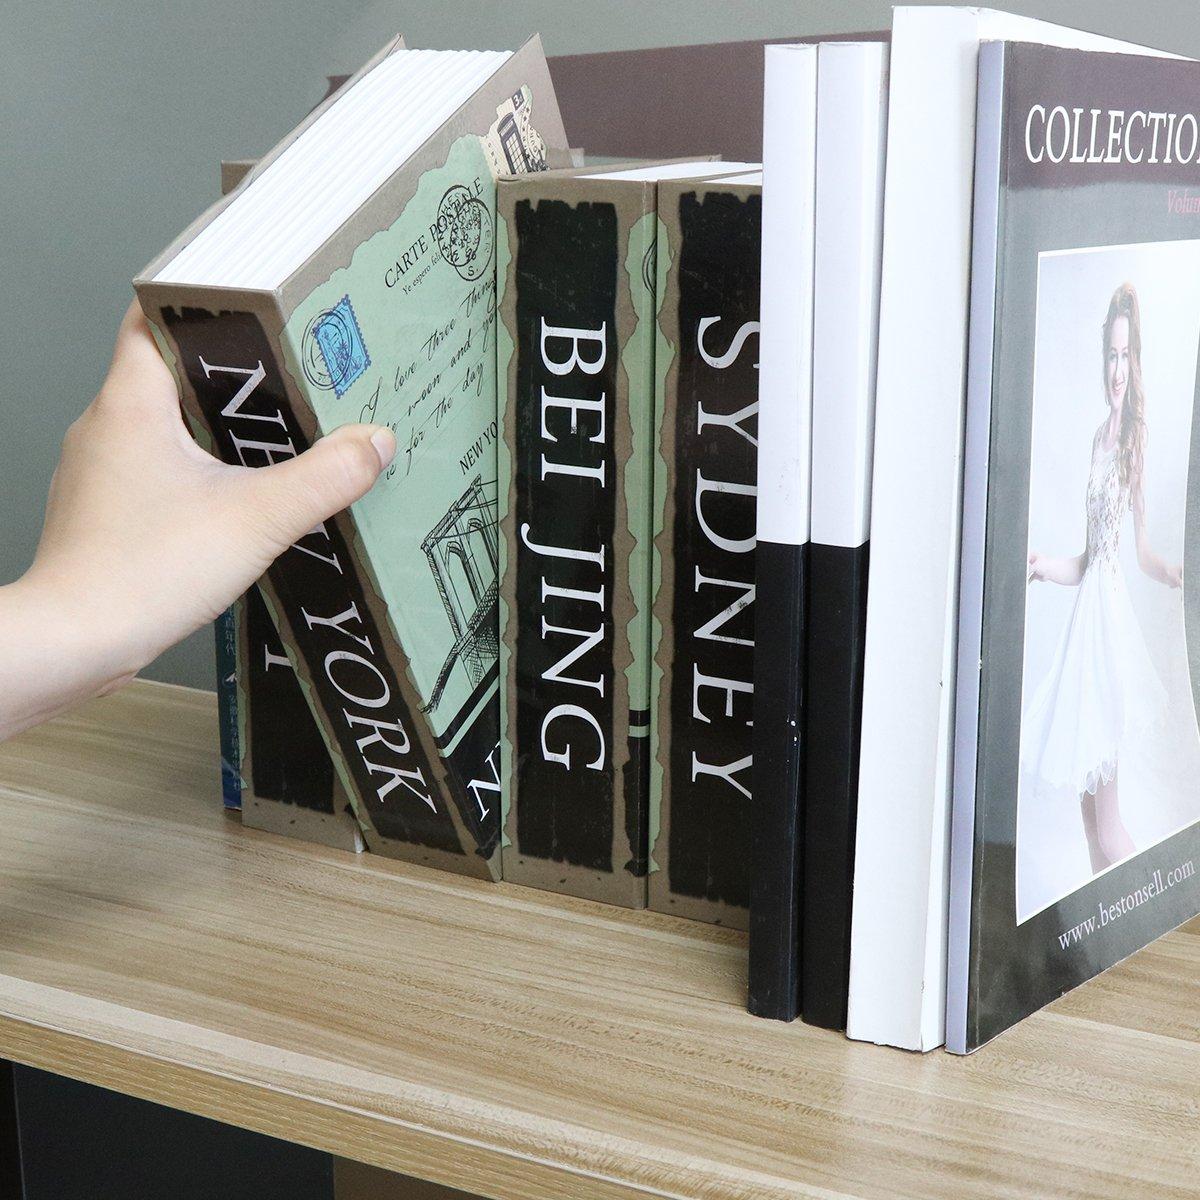 Diversion Book Safe with Combination Lock, Decaller Safe Secret Hidden Metal Lock Box, 9 1/2'' x 6'' x 1 1/3'', New York by Decaller (Image #8)